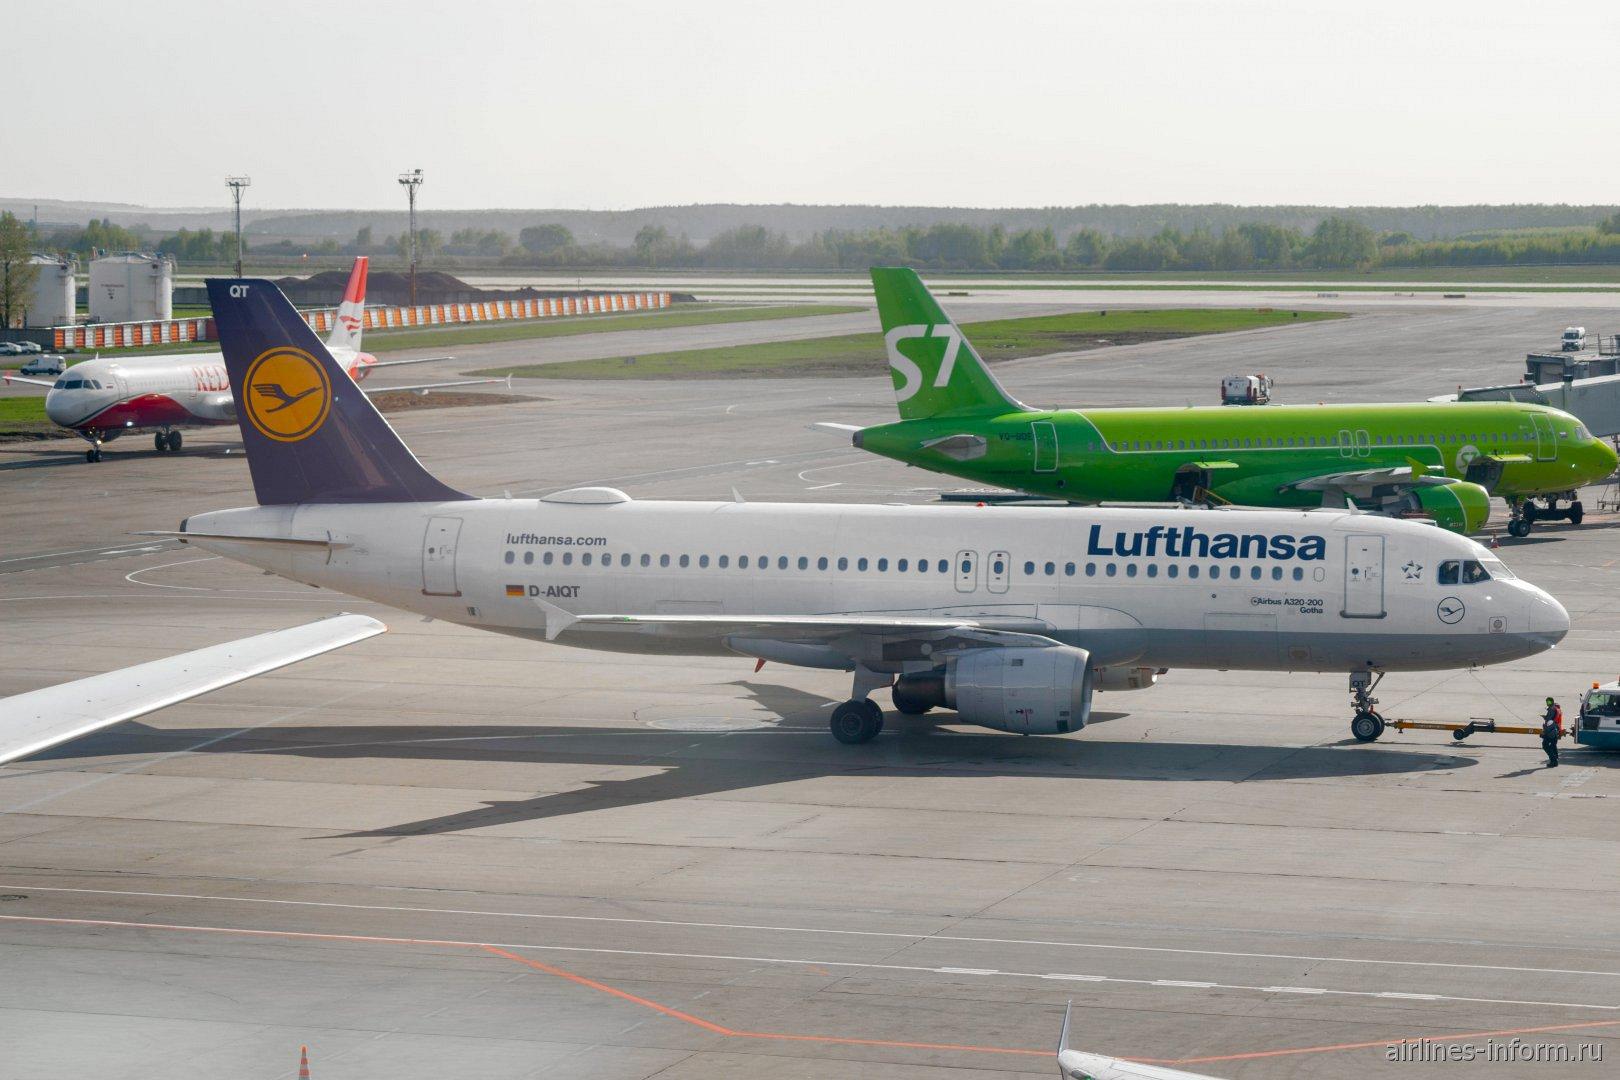 Airbus A320 D-AIQT авиакомпании Lufthansa в аэропорту Москва Домодедово